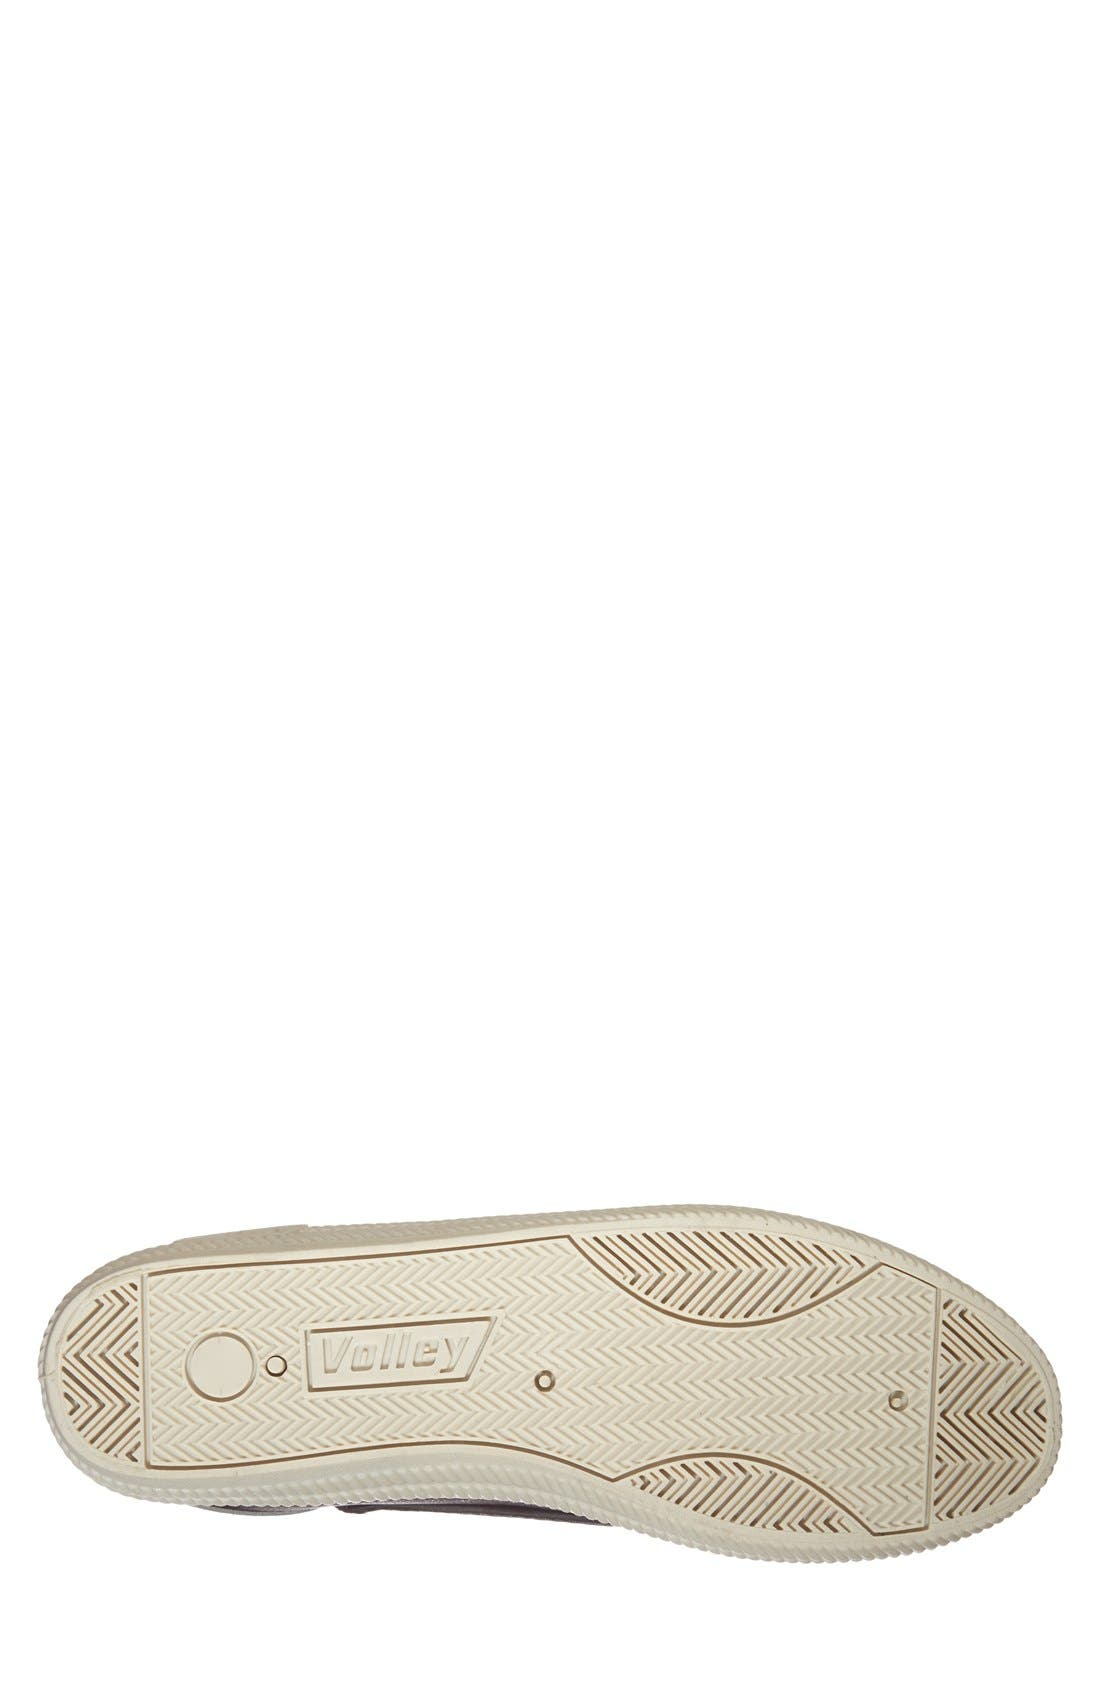 'International' Leather Sneaker,                             Alternate thumbnail 2, color,                             015